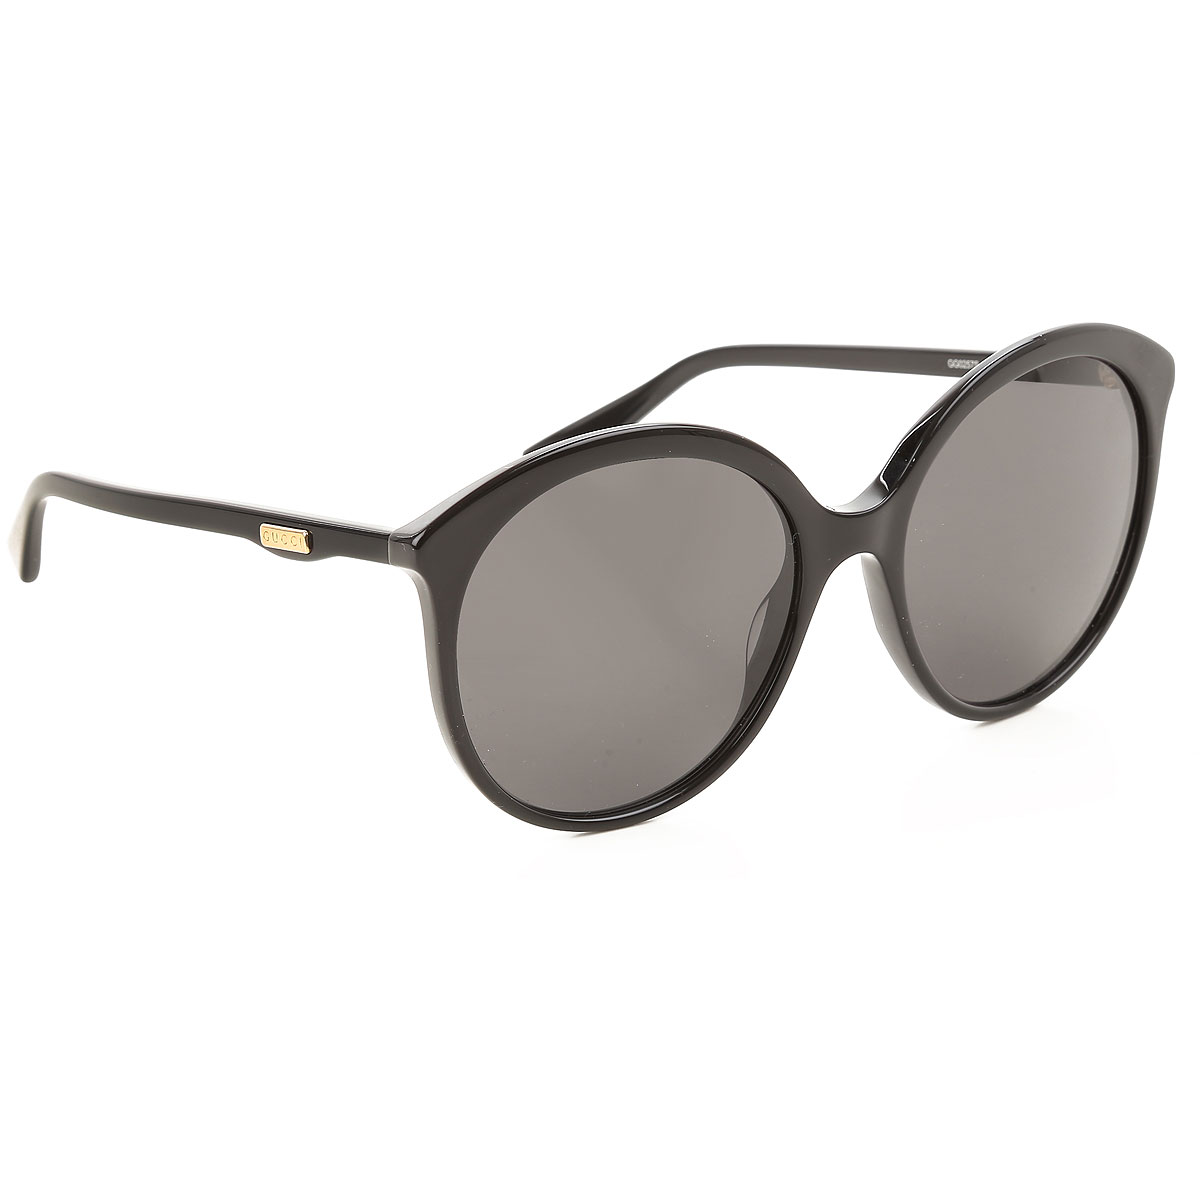 Gafas y Lentes de Sol Gucci, Detalle Modelo: gg0257s-001-